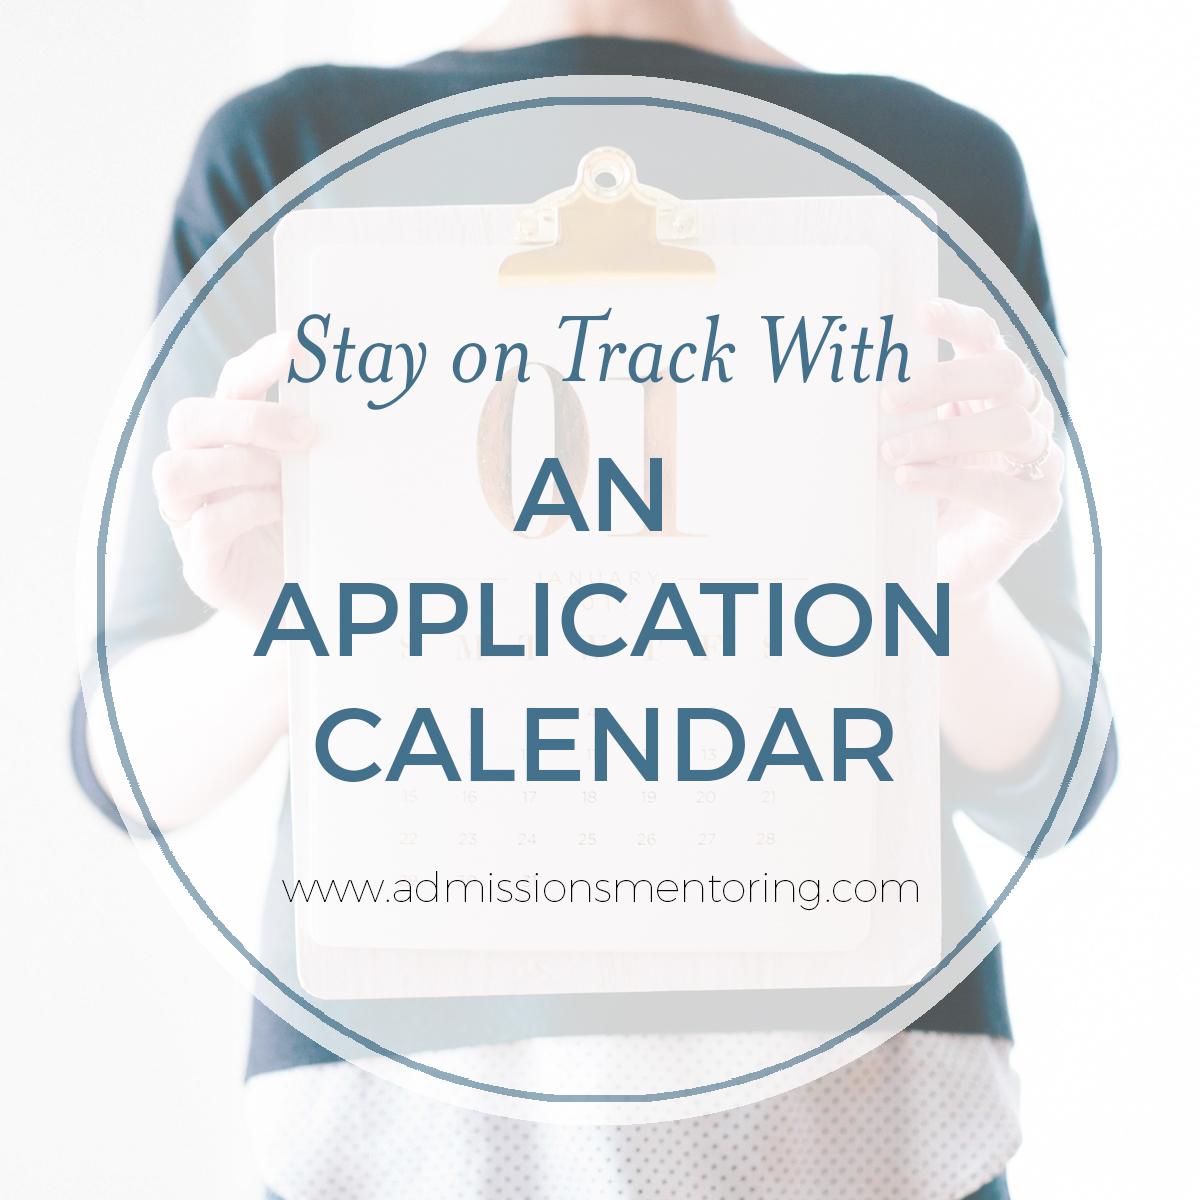 Admissions-Mentoring-Application-Calendar.jpg